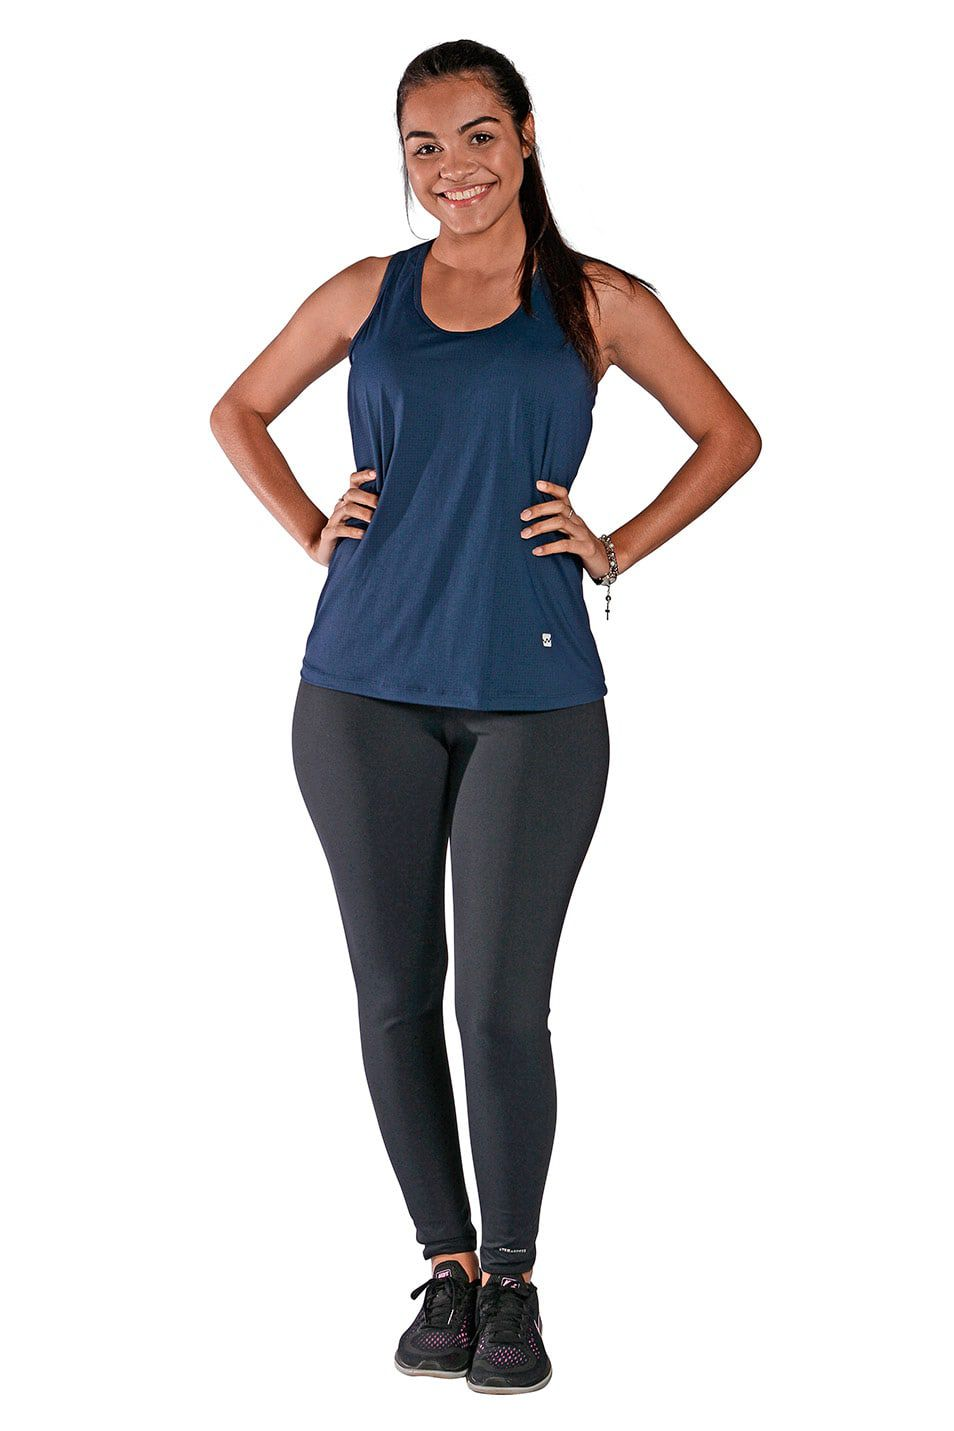 Camiseta Feminina Regata UV 50+ New Trip Azul Marinho